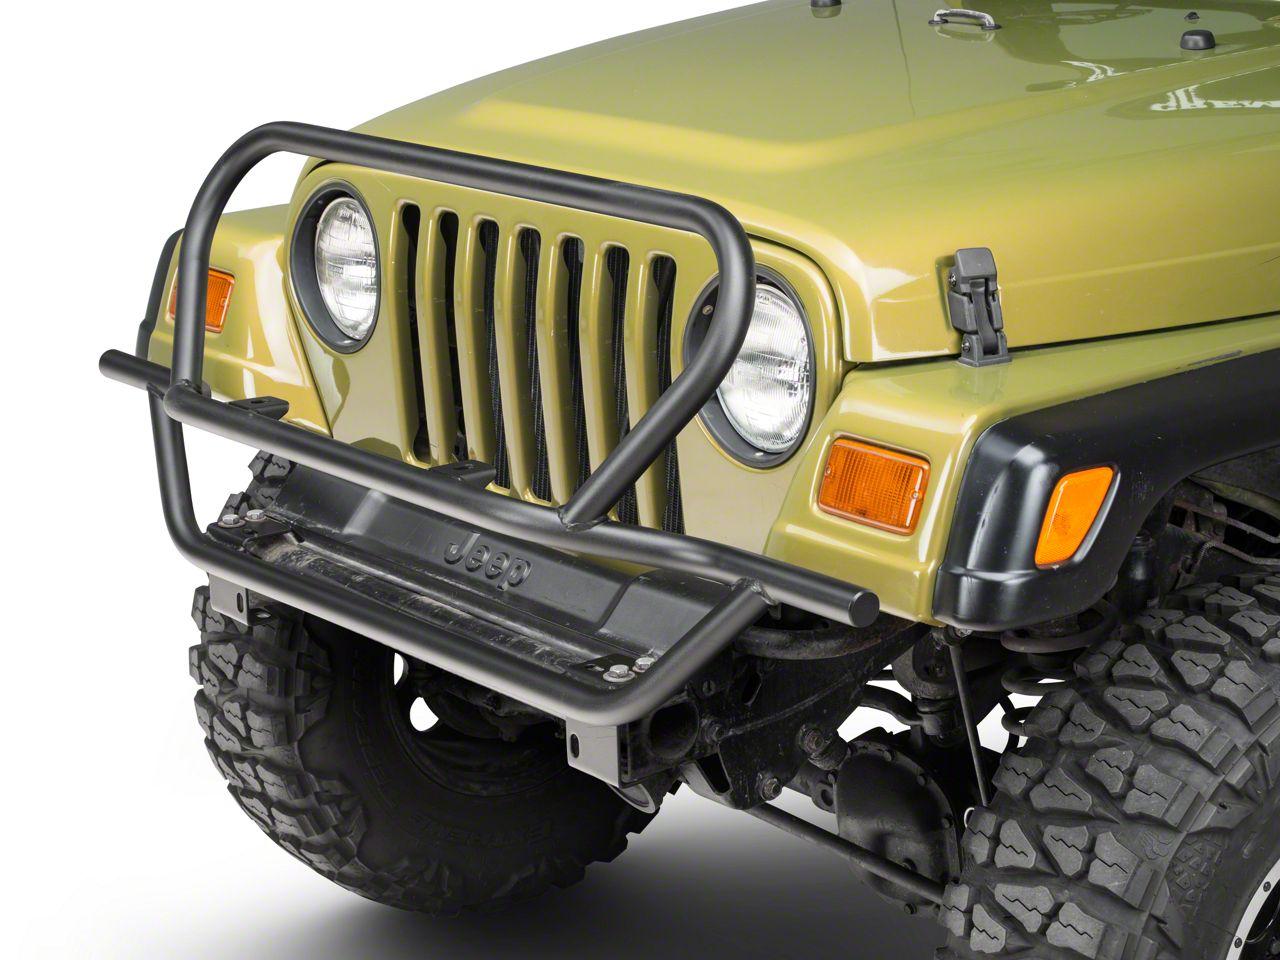 Olympic 4x4 A/T Rock Slider Front Bumper w/ Hoop - Textured Black (97-06 Jeep Wrangler TJ)